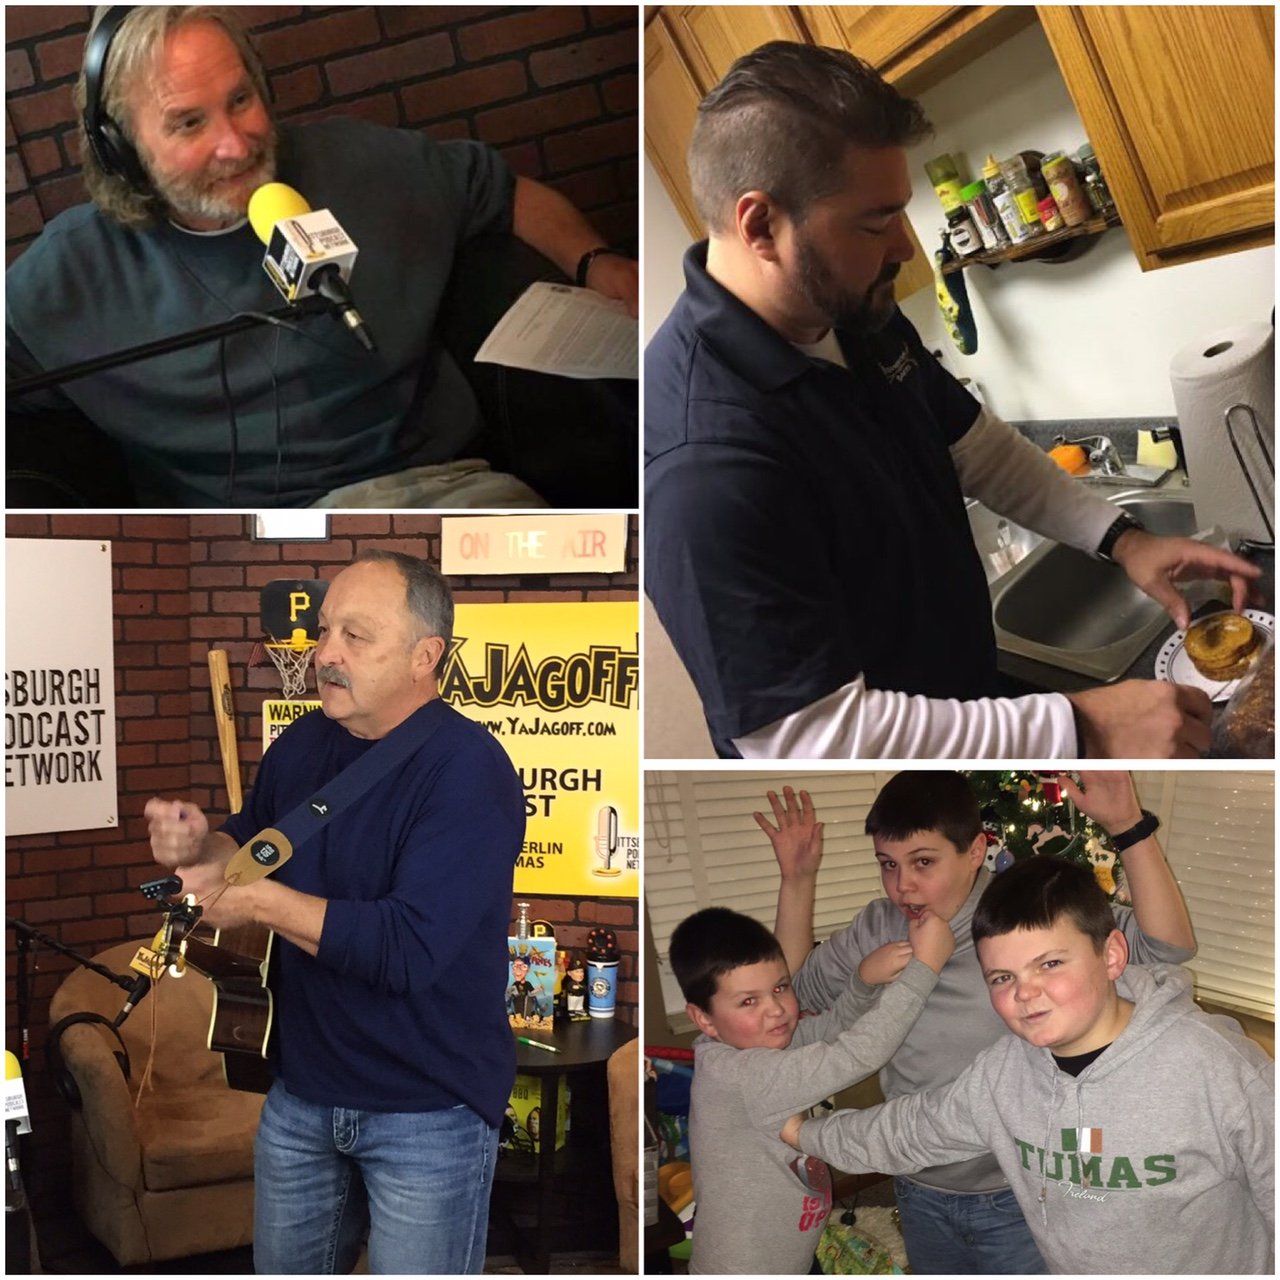 YaJagoff Podcast, Sean McDowell, Brian Trottier, Scott Baker, 5 Generations Bakers